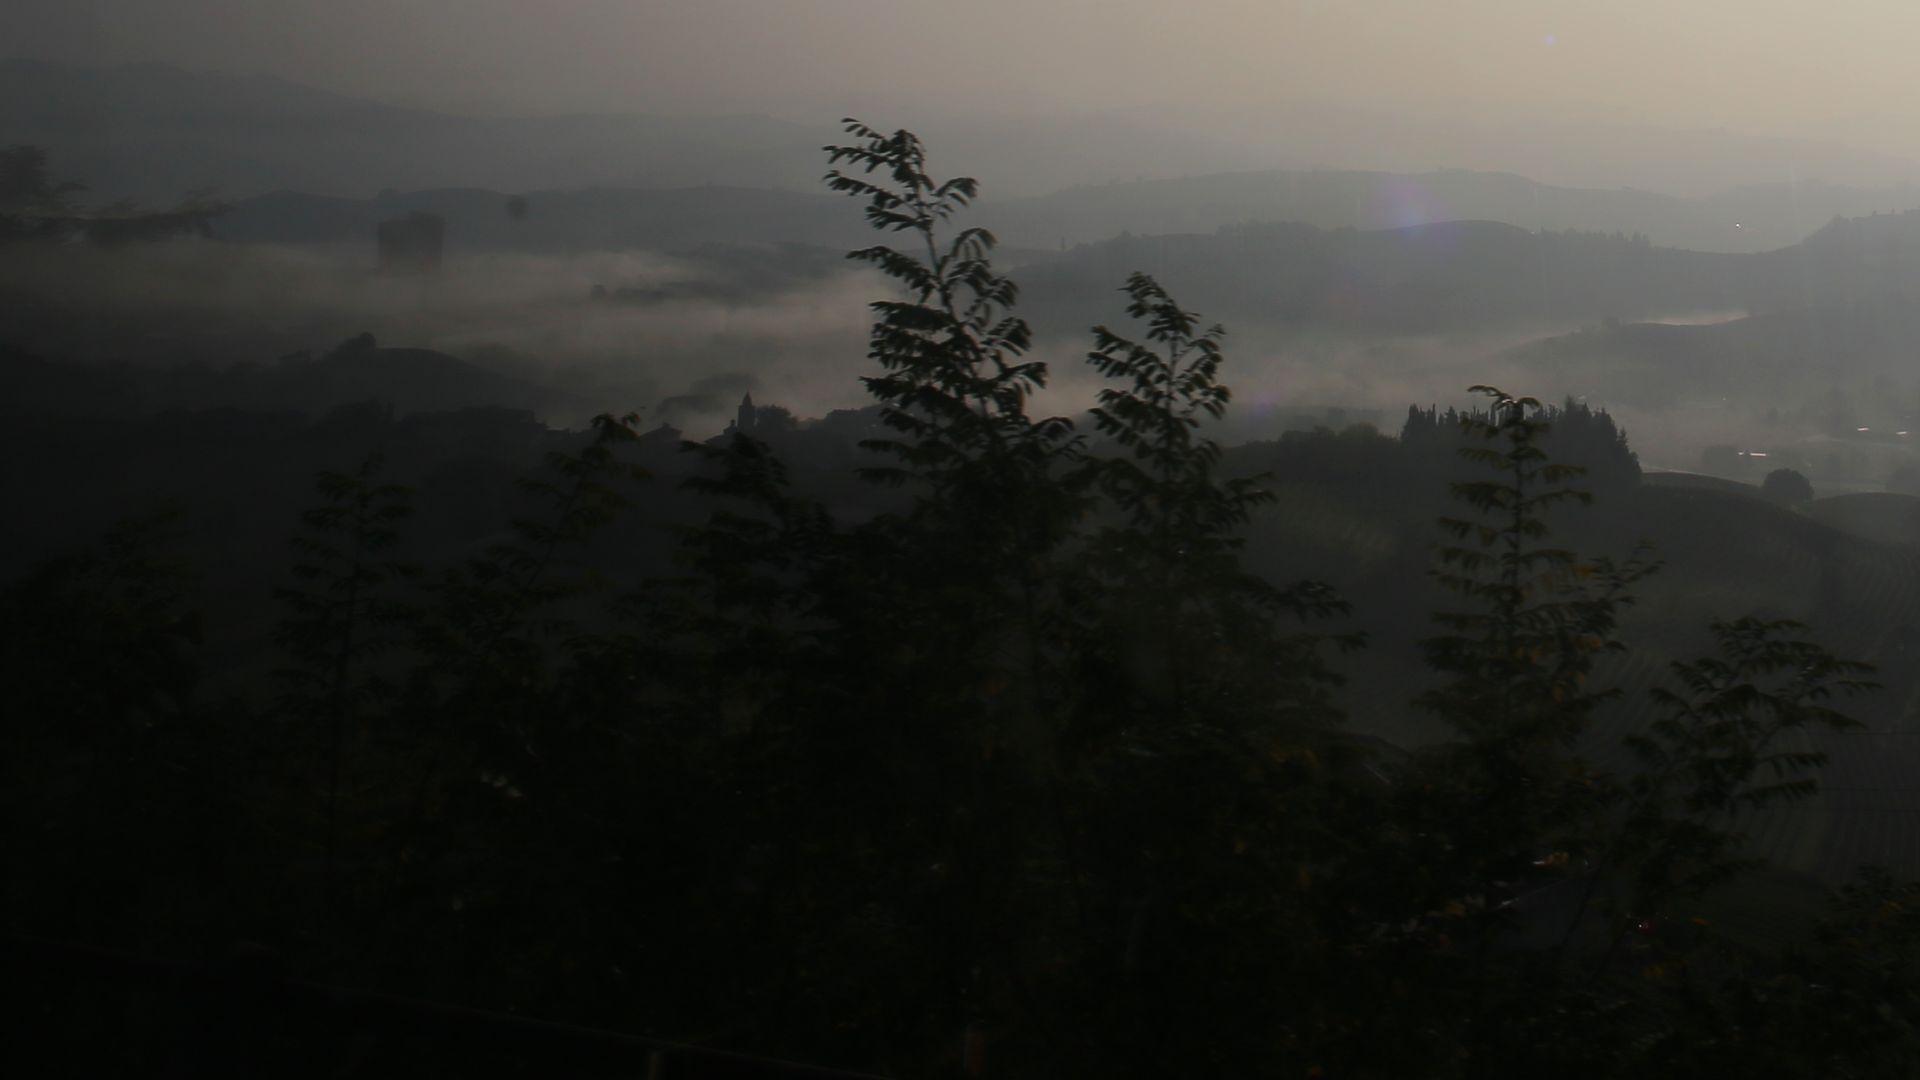 Piemonte Nebbiolo dimma